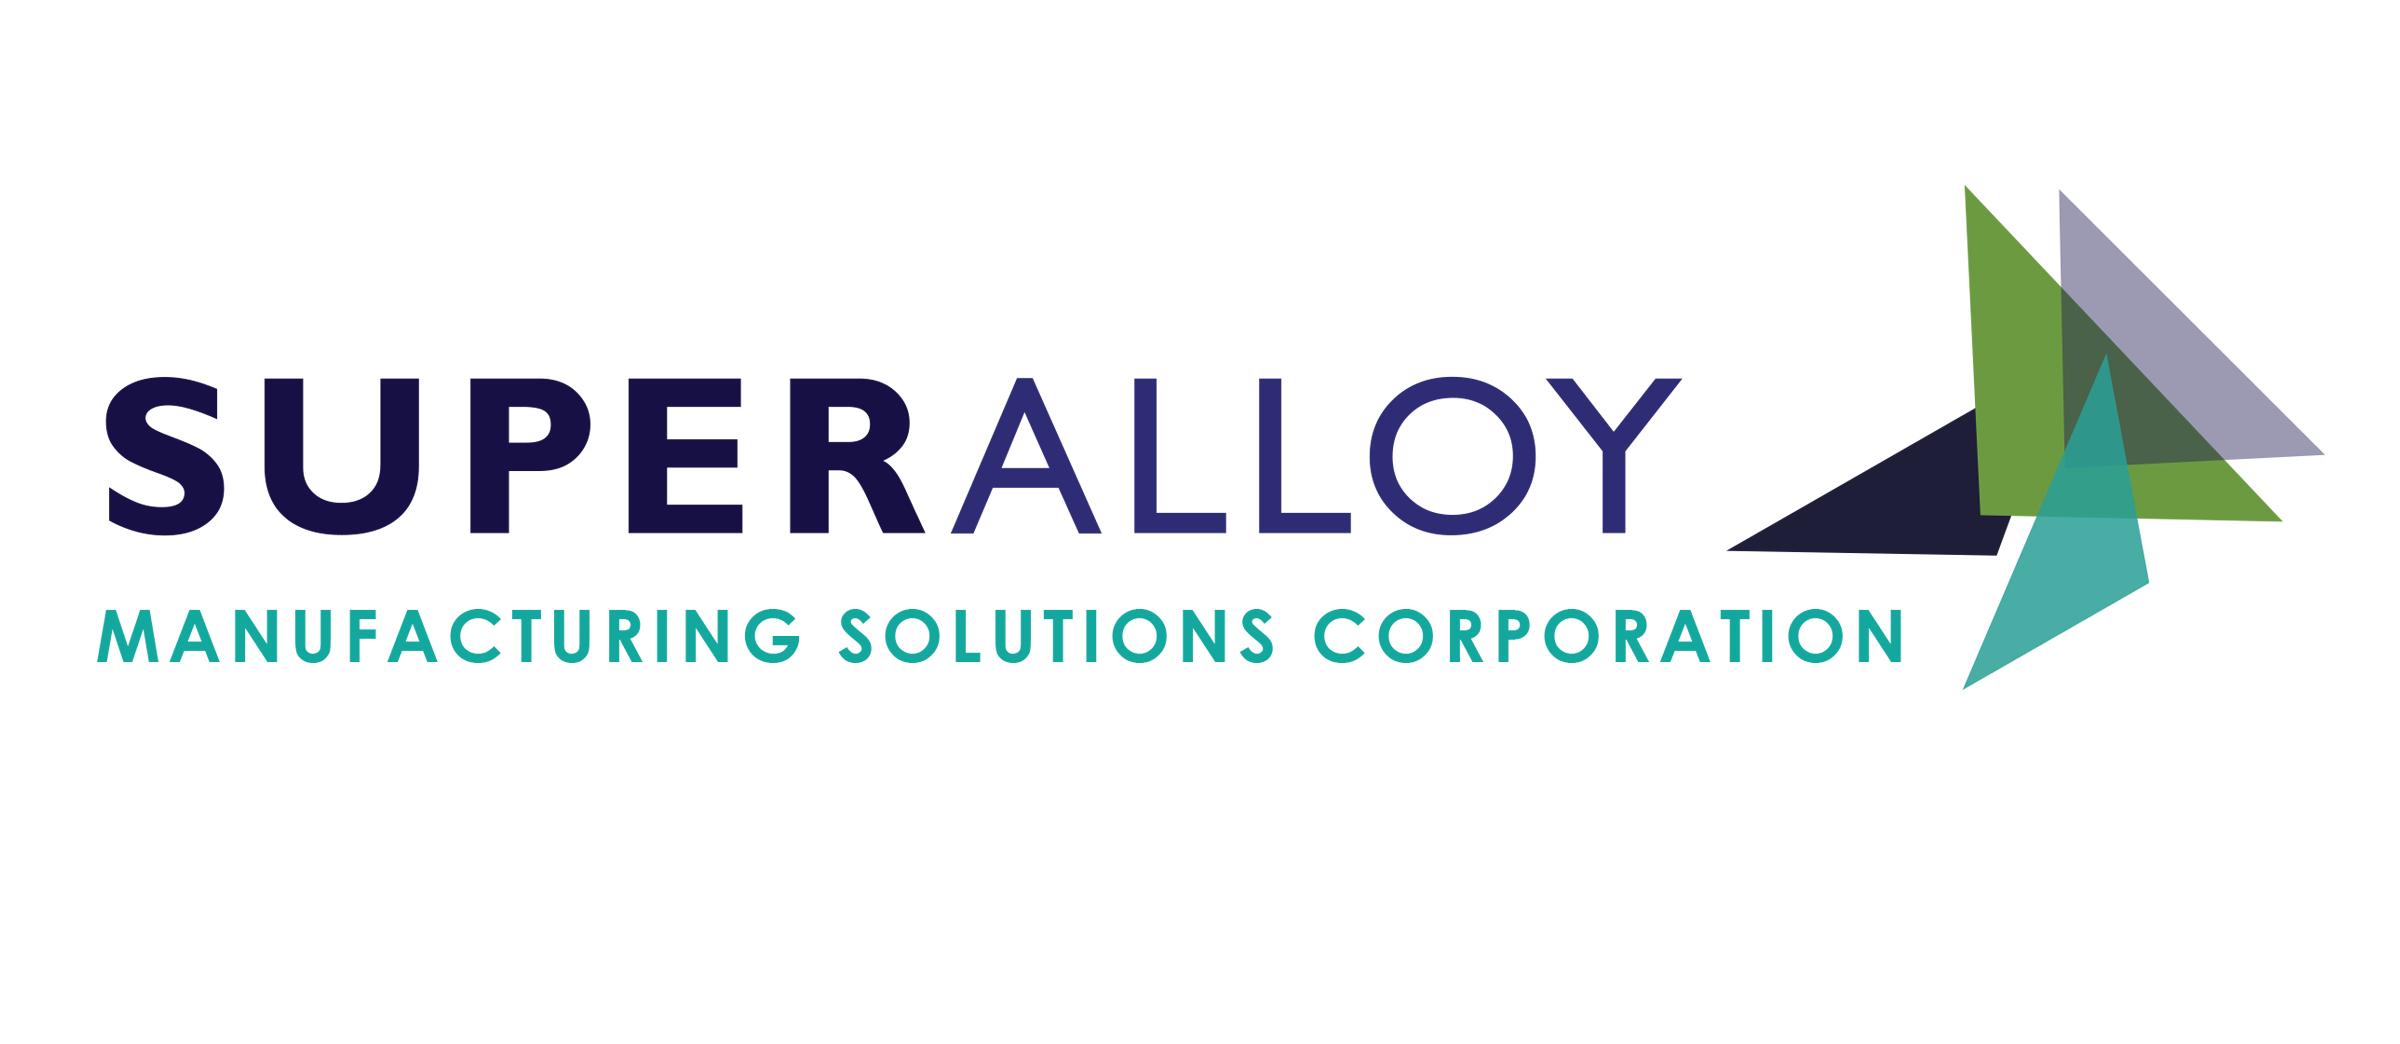 Portfolio Companies — American Industrial Acquisition Corporation